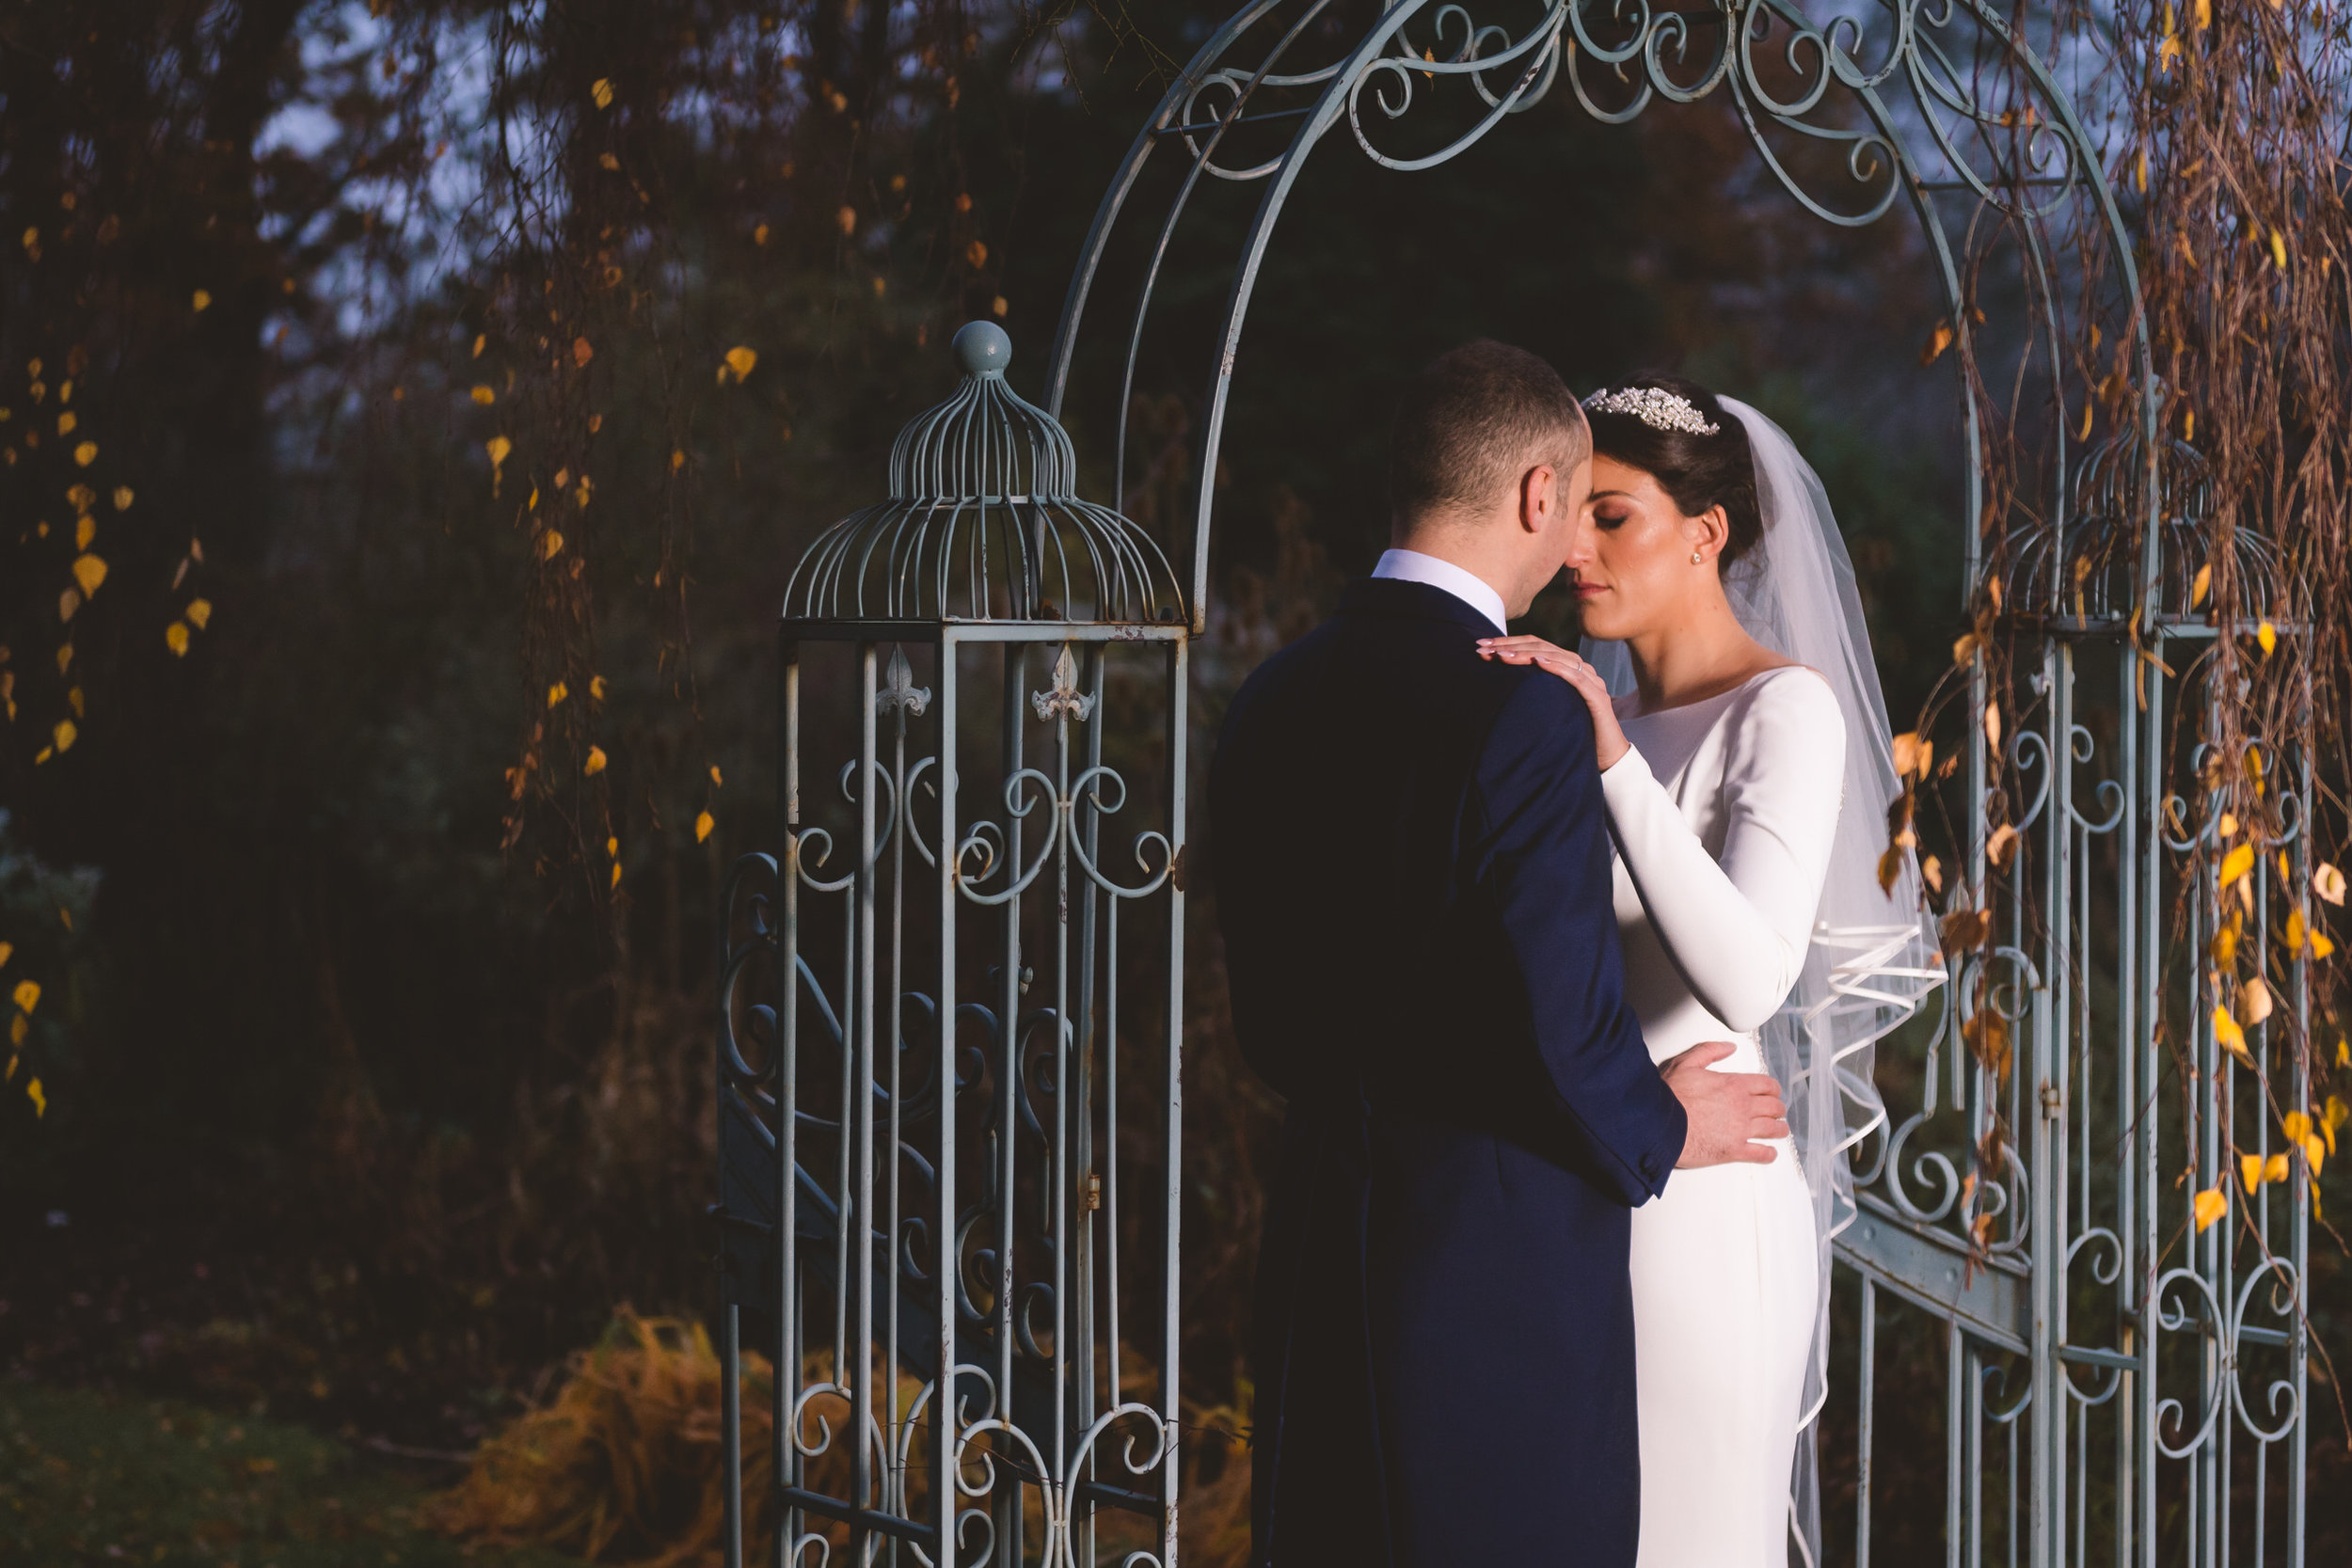 wharfedale-grange-harrogate-wedding-photographer-54.jpg